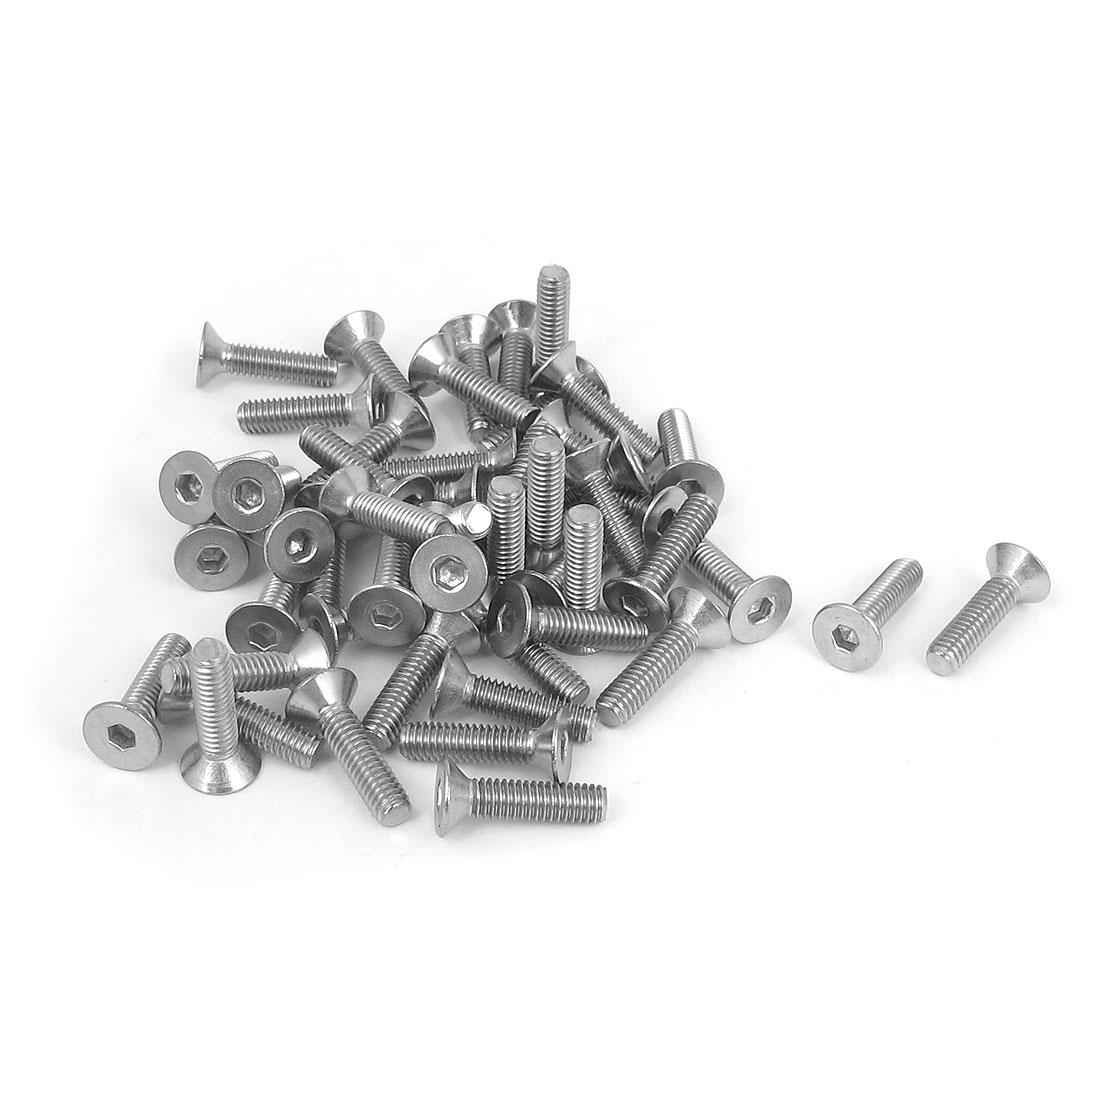 M4 x 16mm Metric 304 Stainless Steel Hex Socket Countersunk Flat Head Screw Bolts 50PCS